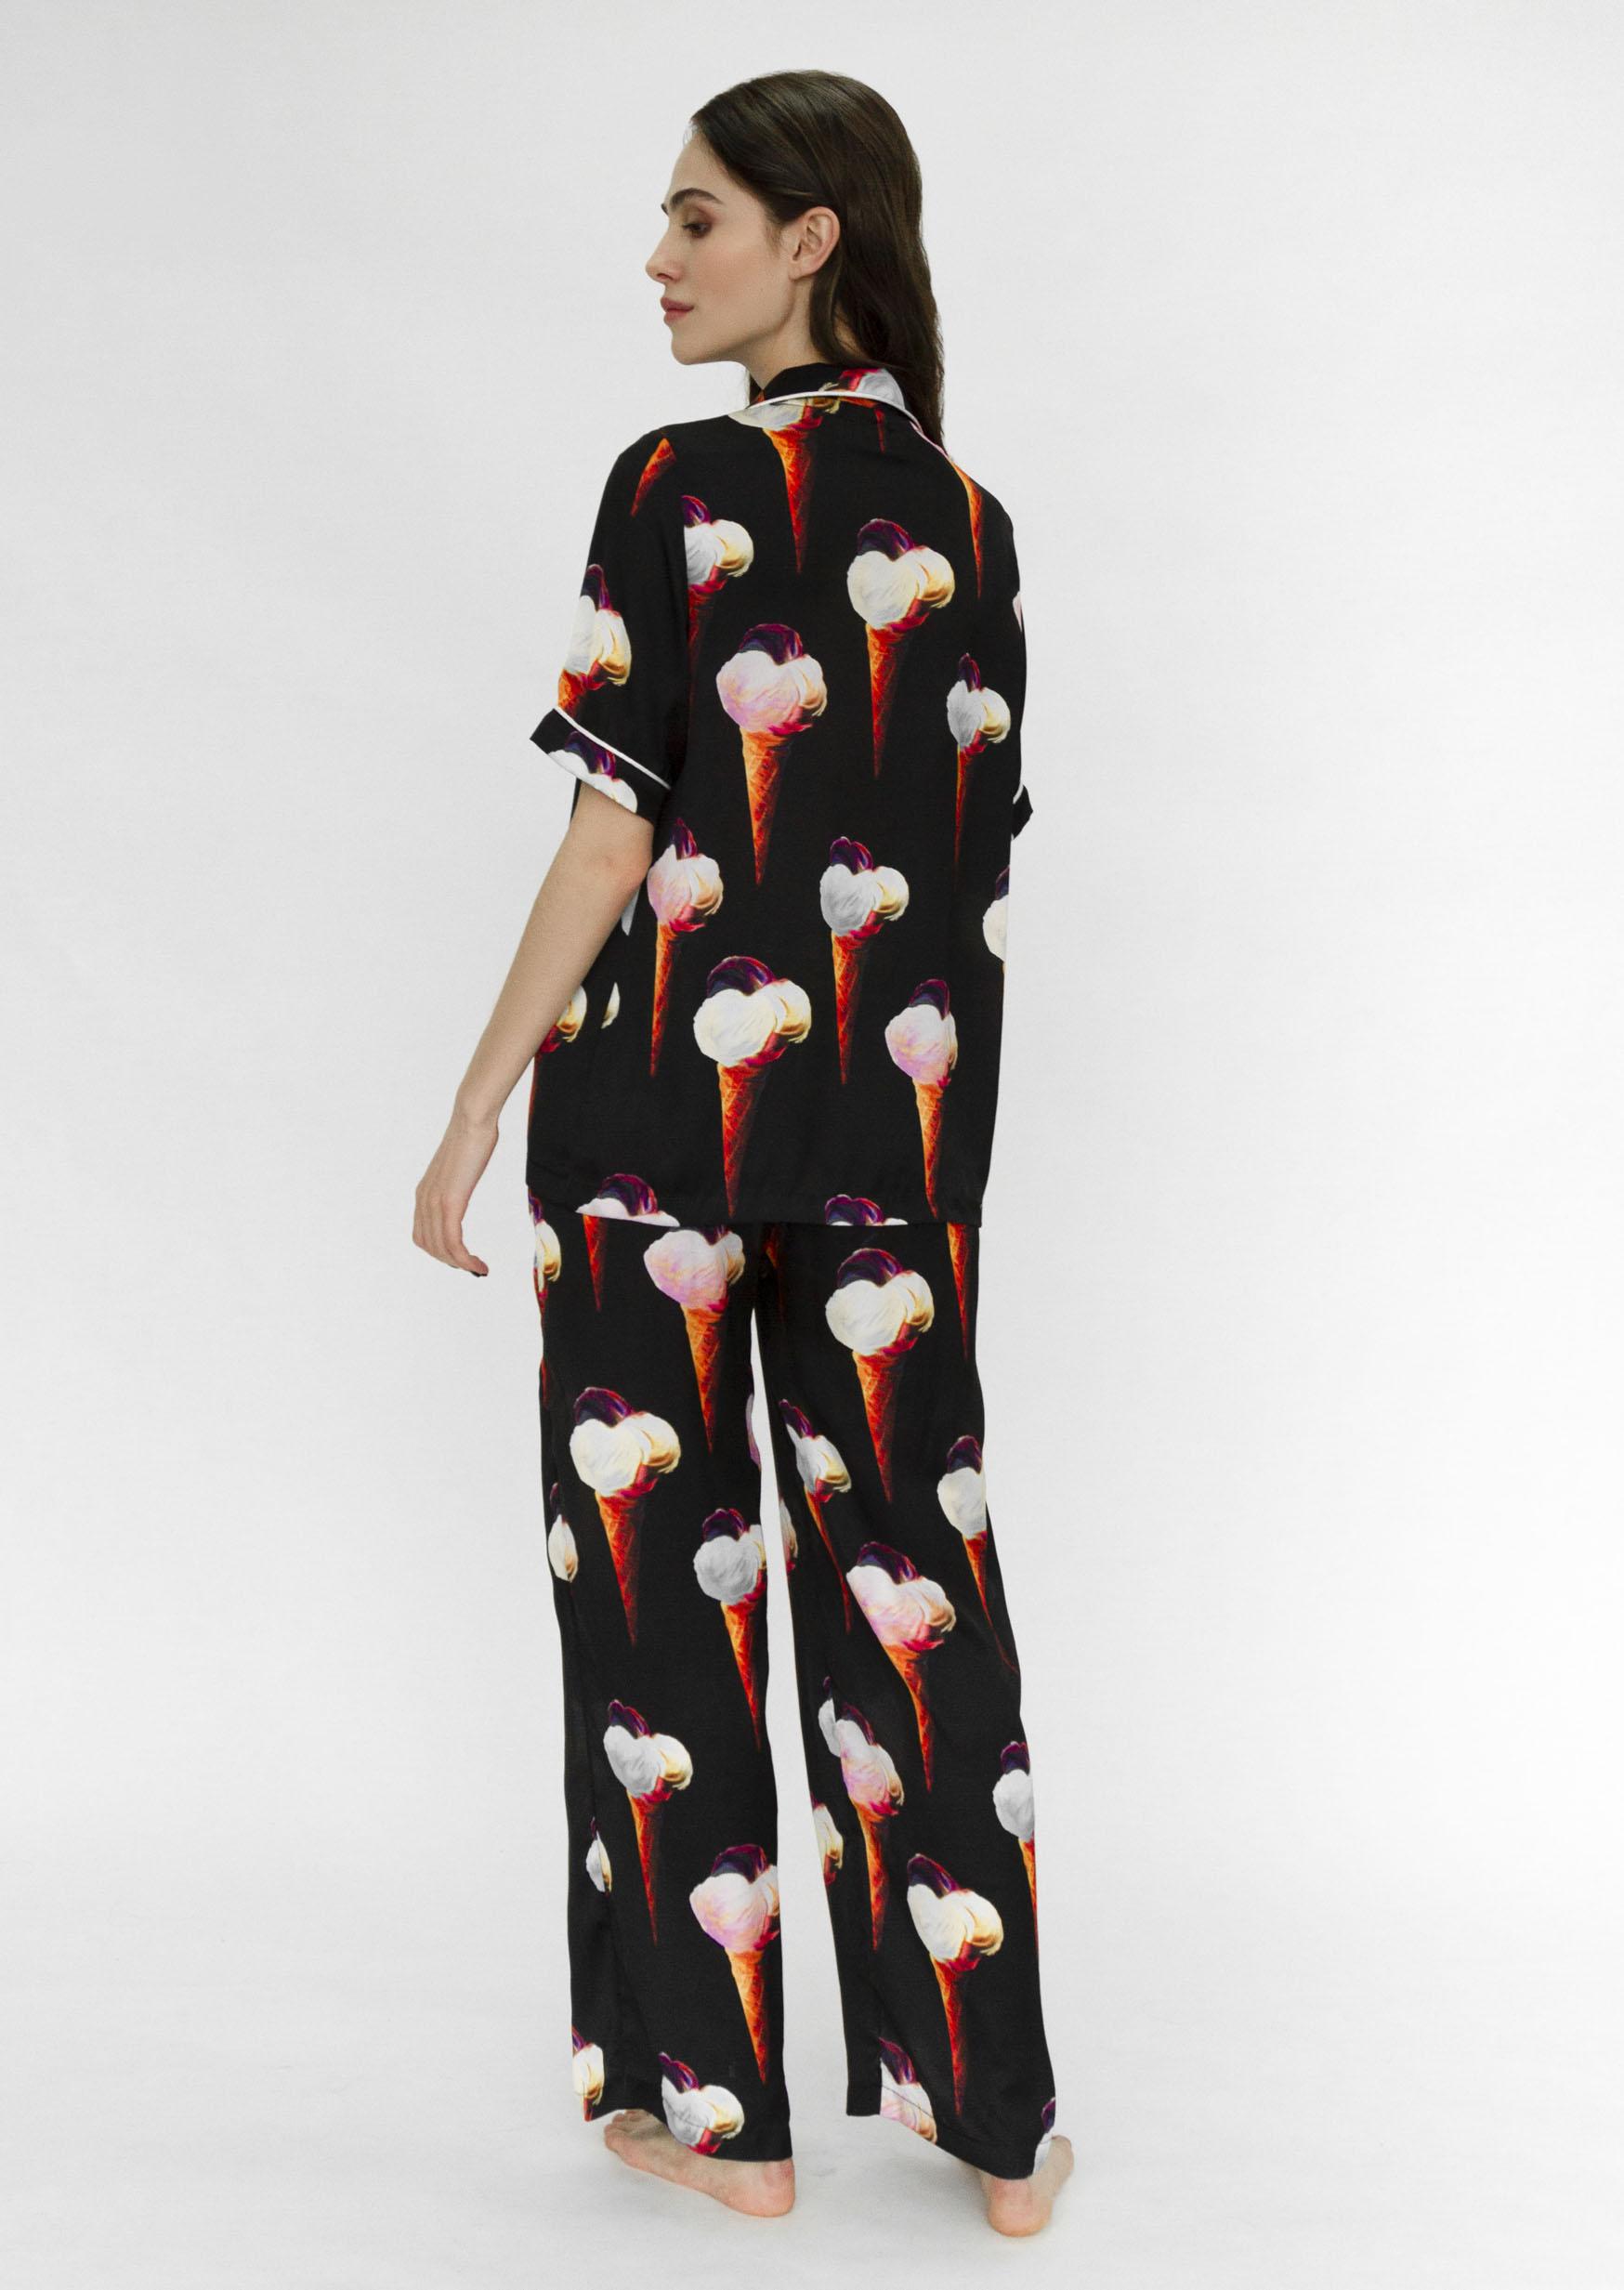 Ice-cream party loungewear set black organic pajama set with print